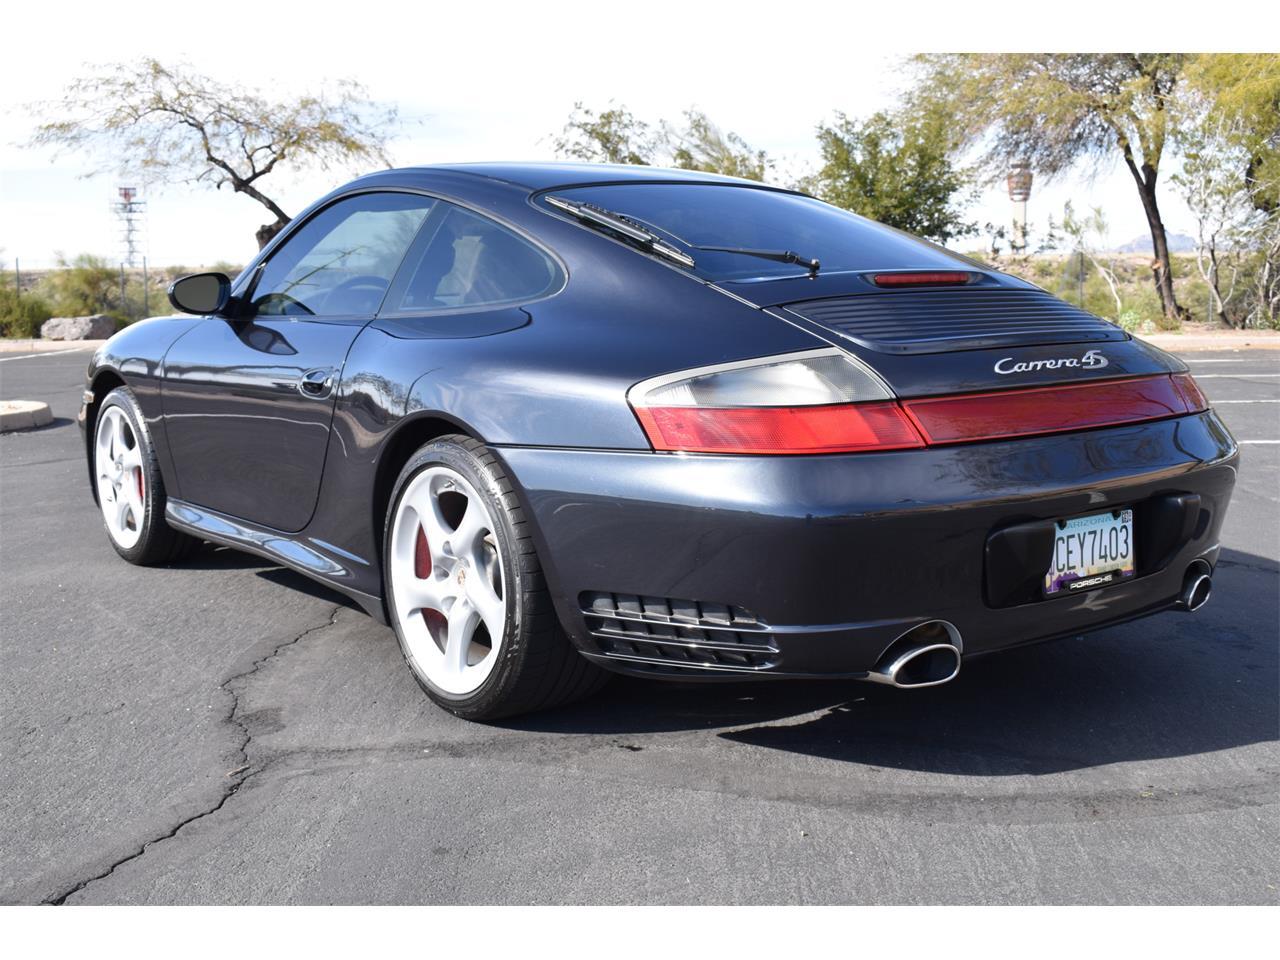 15804376-2004-porsche-911-carrera-4s-std